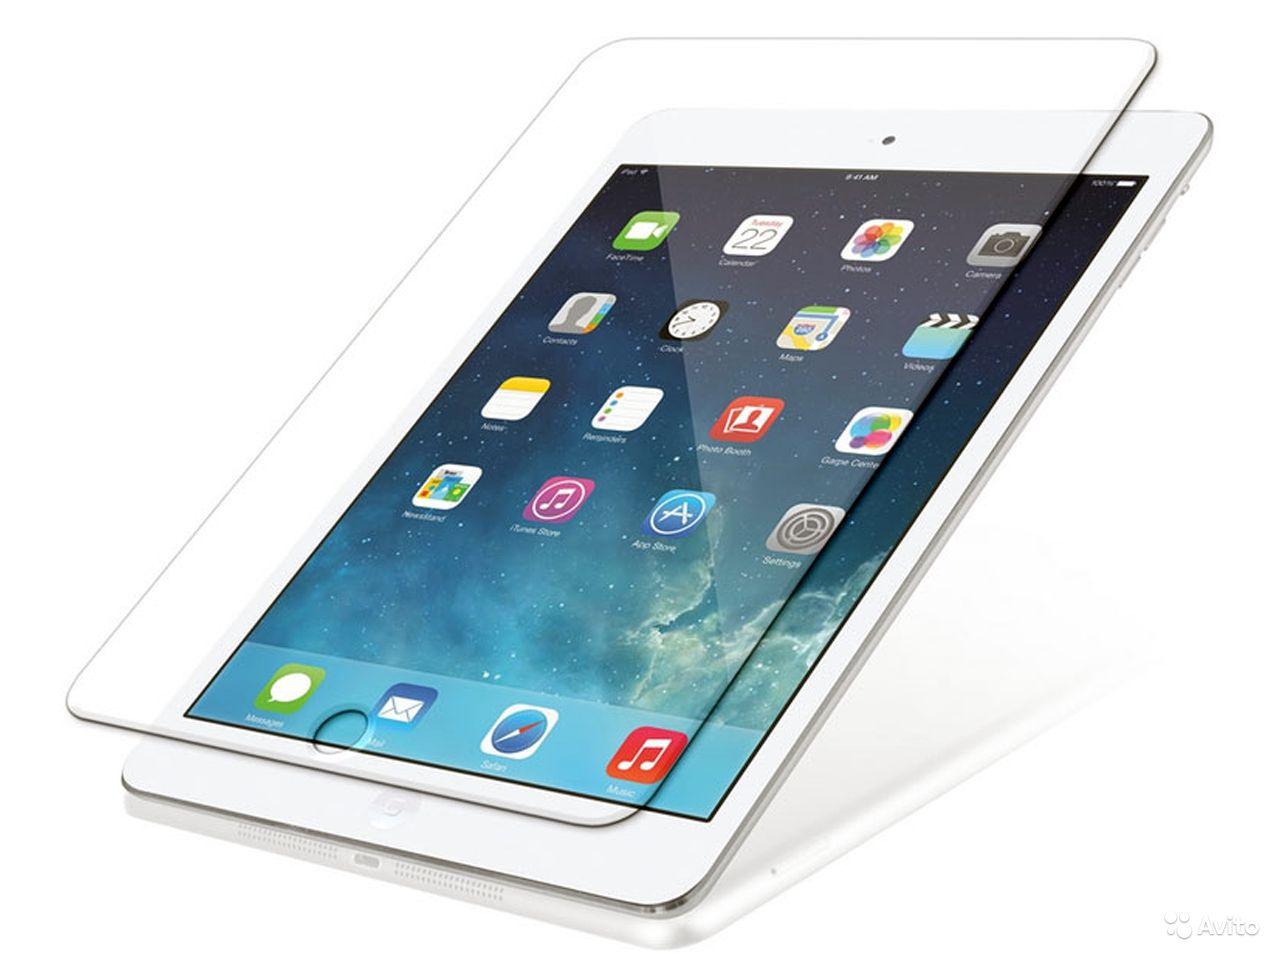 Фото - Защитная пленка TipTop Apple iPad Air/iPad Air2, 4605180004730 защитная пленка tiptop apple ipad air ipad air2 4605180004730